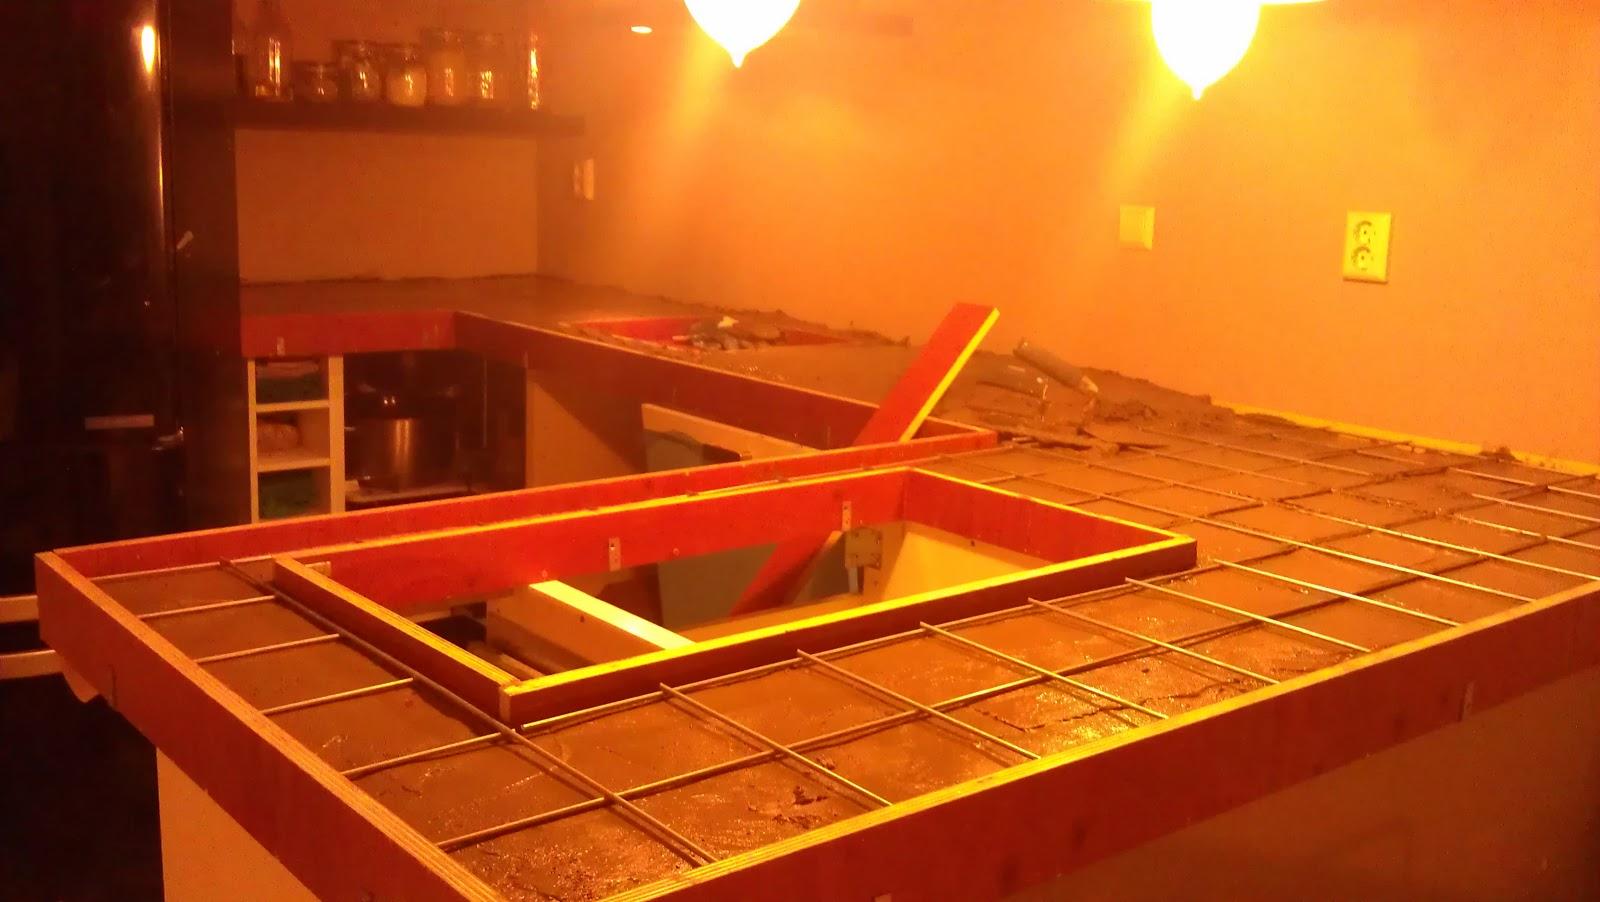 Pimpish DIY stappenplan betonnen aanrecht # Wasbak Gieten_222813